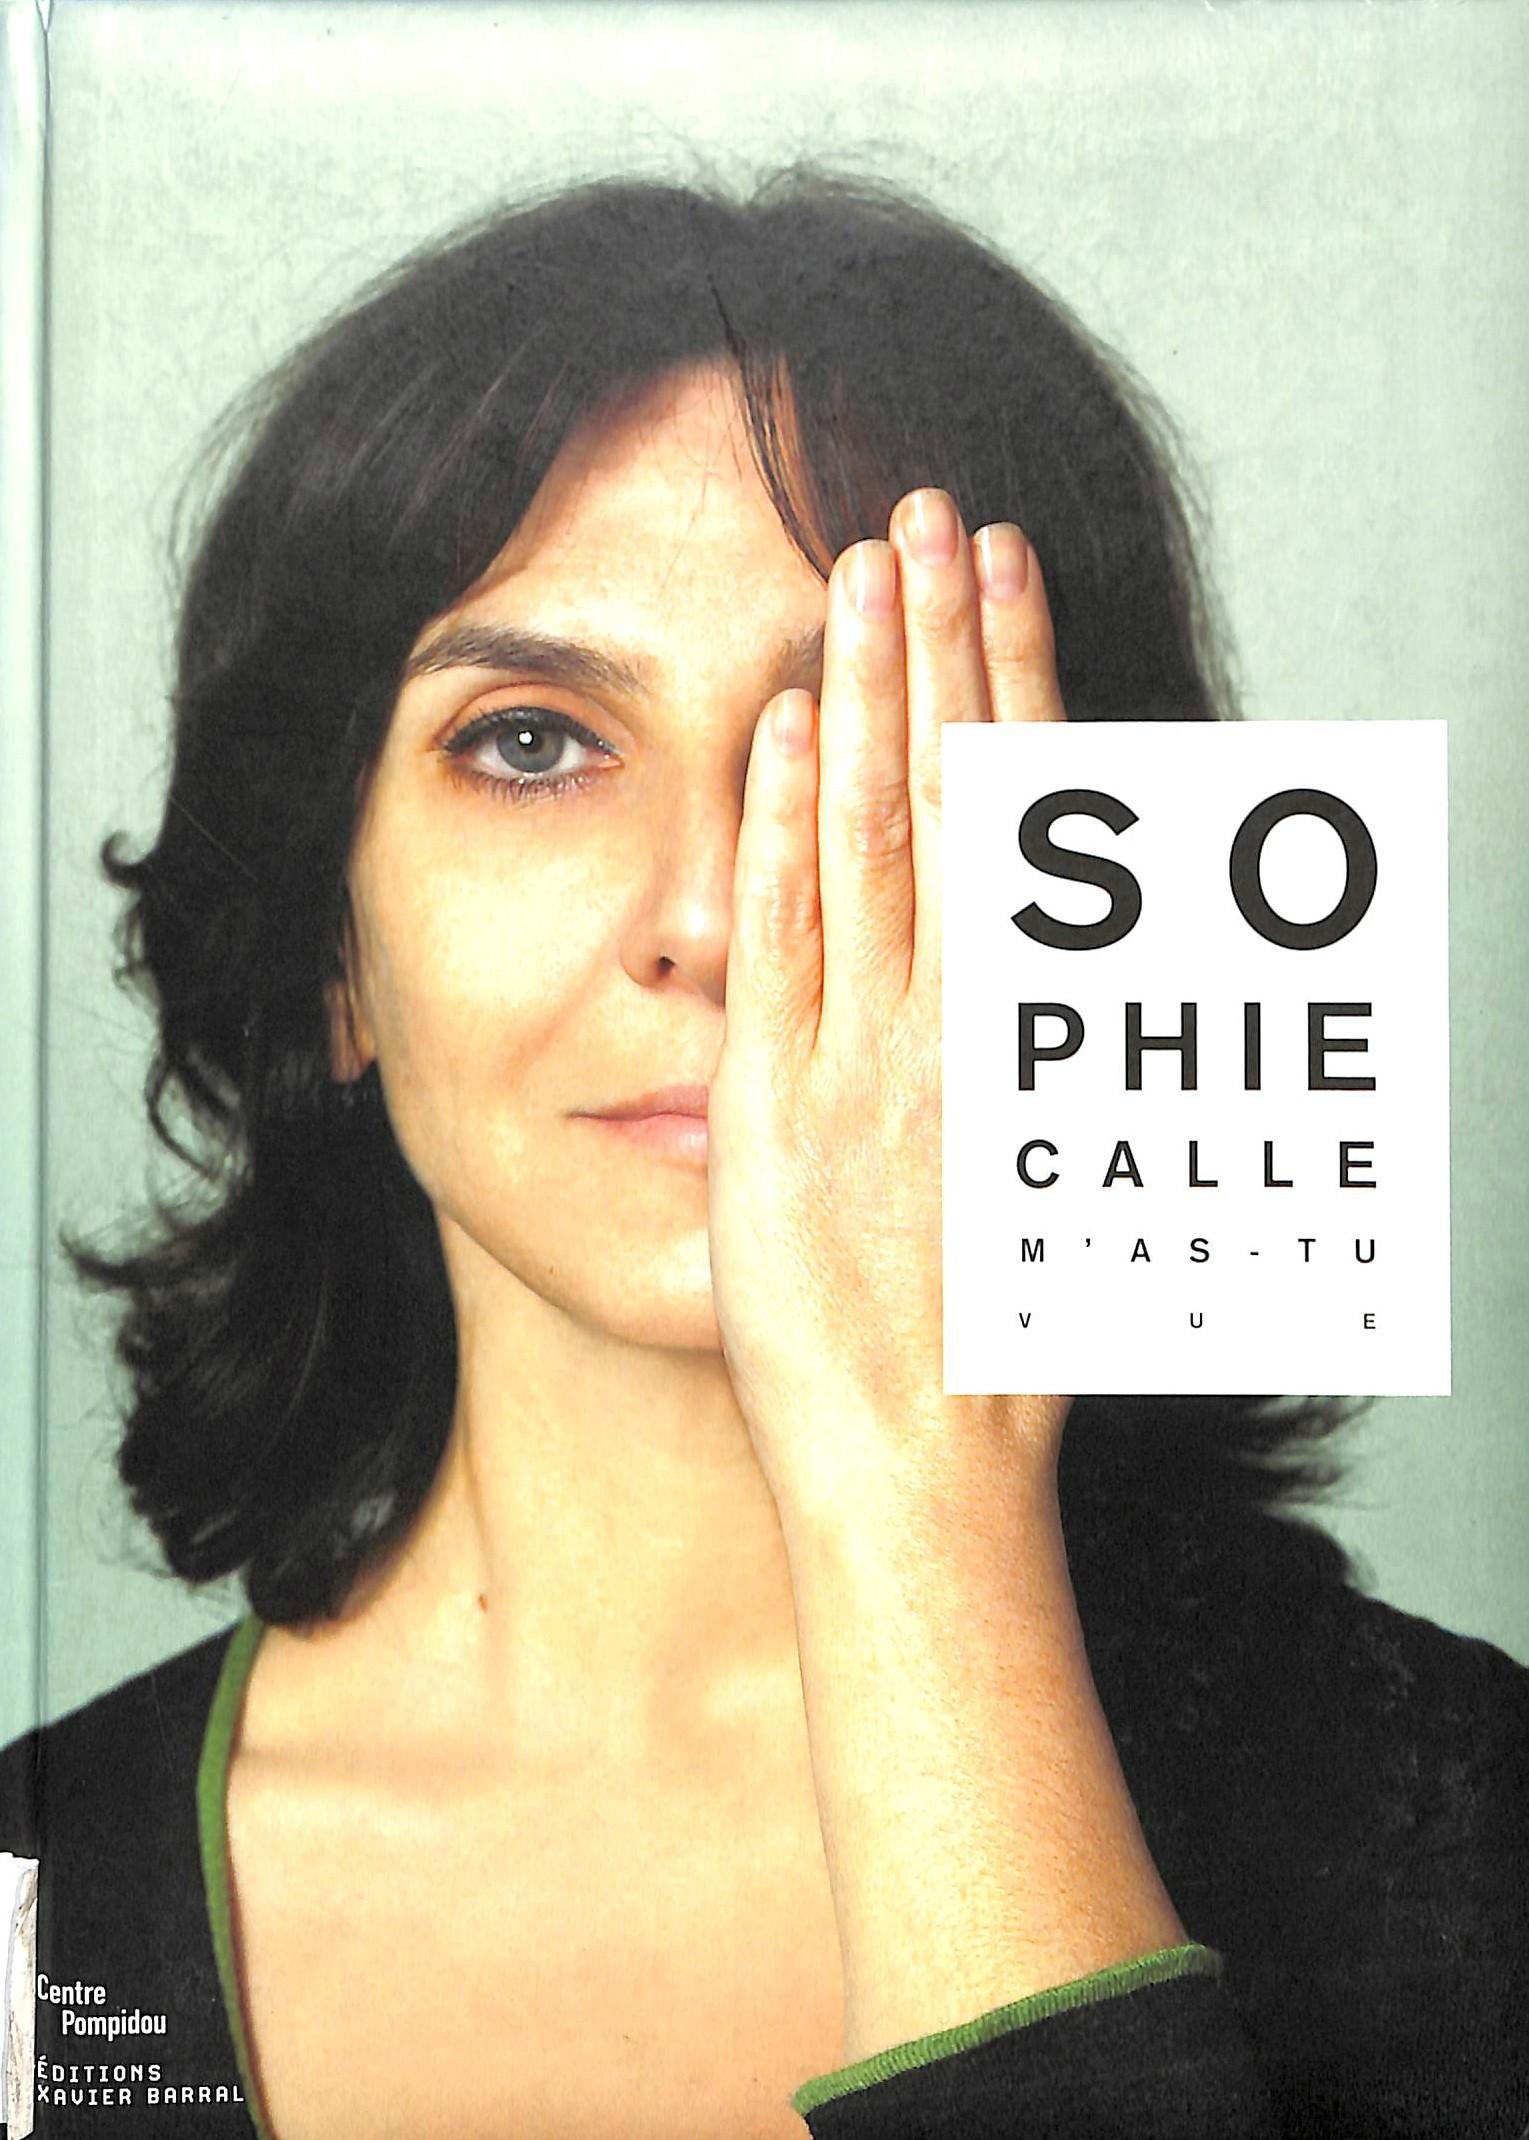 Calle, Sophie; Macel, Christine, Sophie Calle: m'as-tu vue, Munich: Prestel, 2003